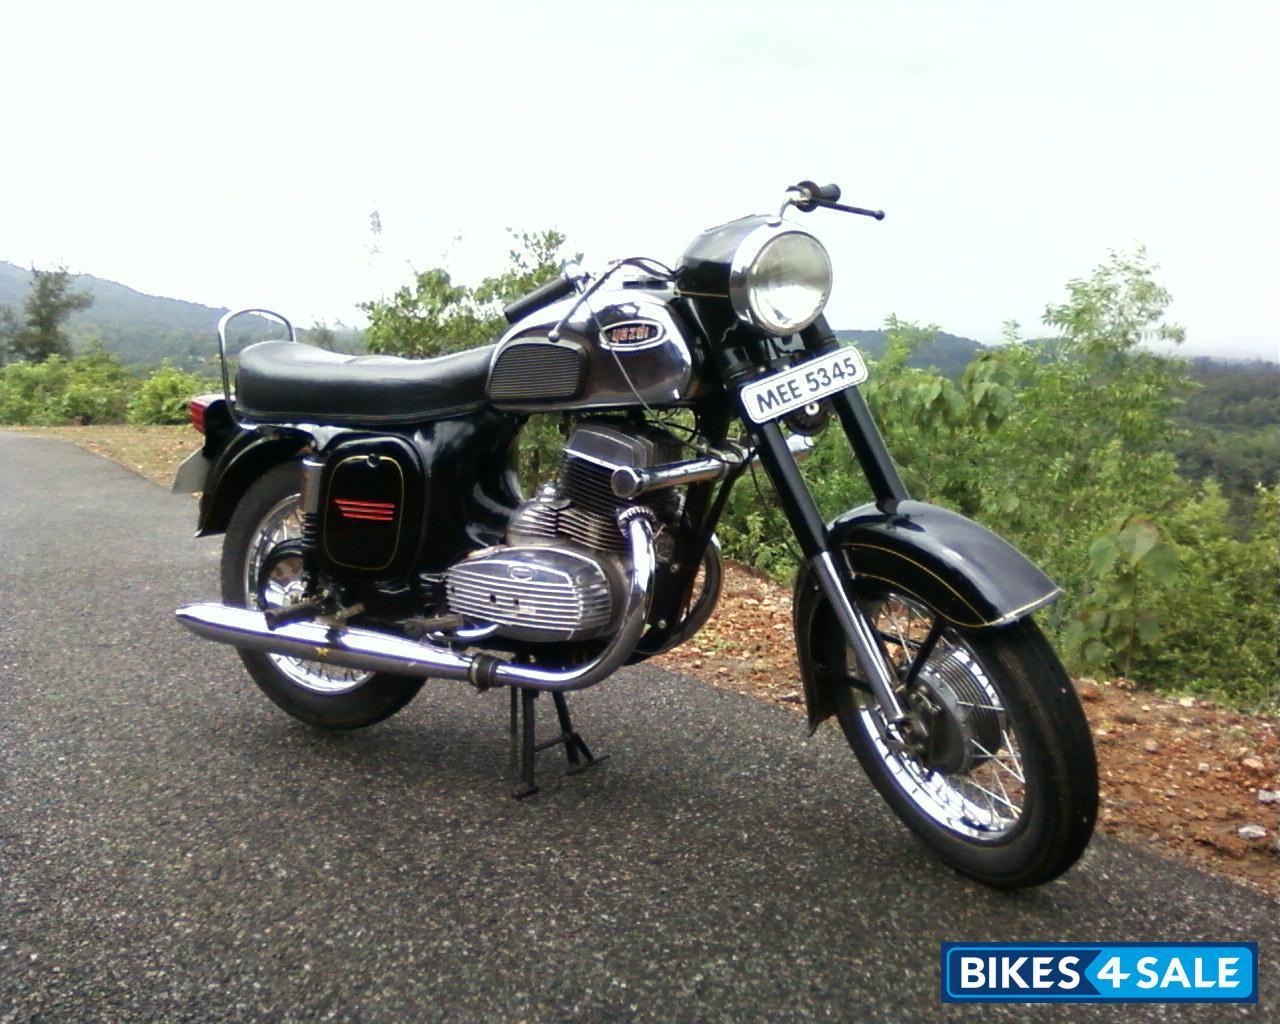 Black Ideal Jawa Yezdi Picture 1. Album ID is 28991. Bike located in ...